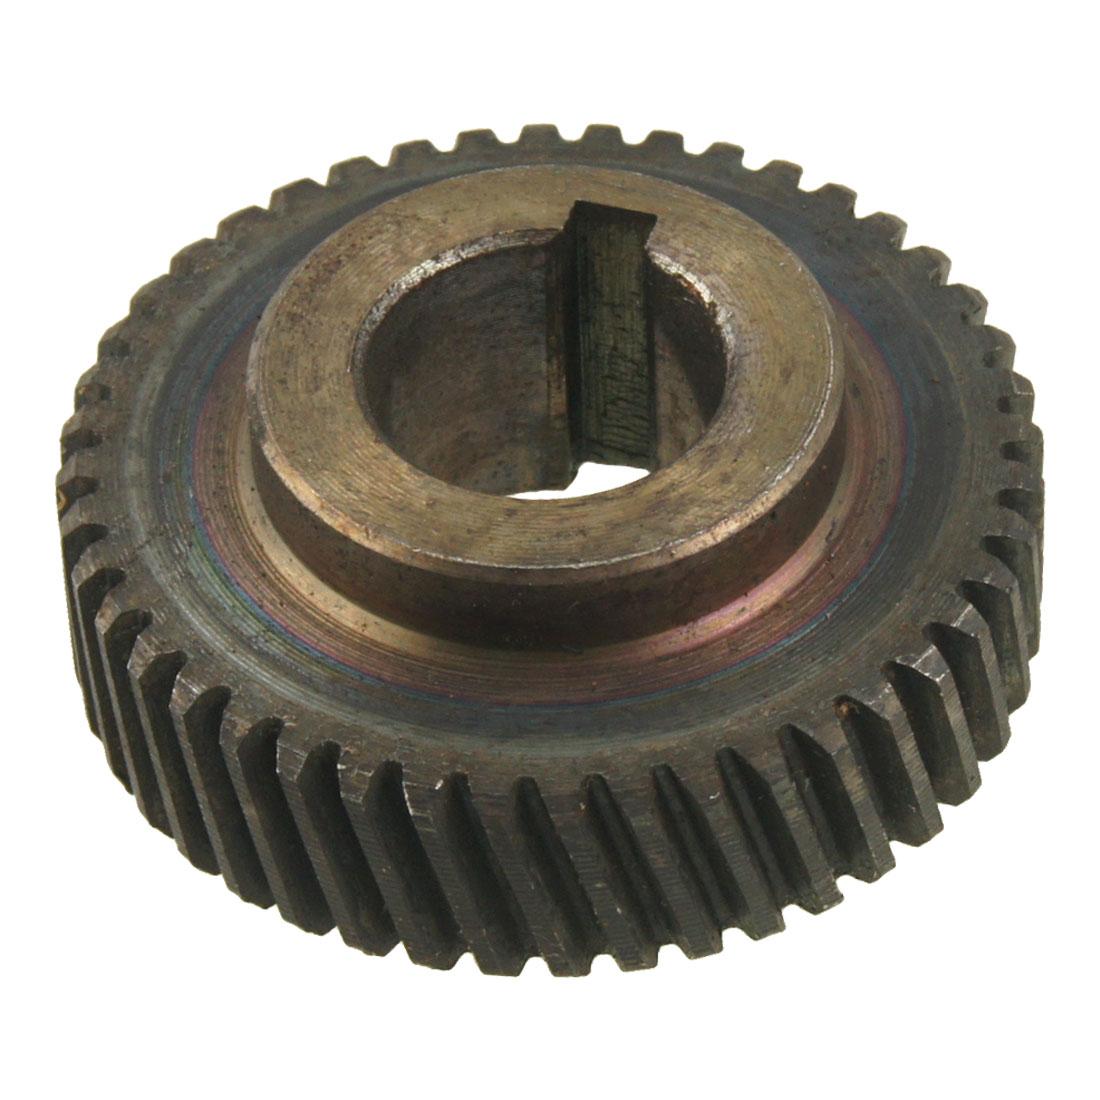 Electric Circular Saw Spiral Bevel Gear for Makita 5900B